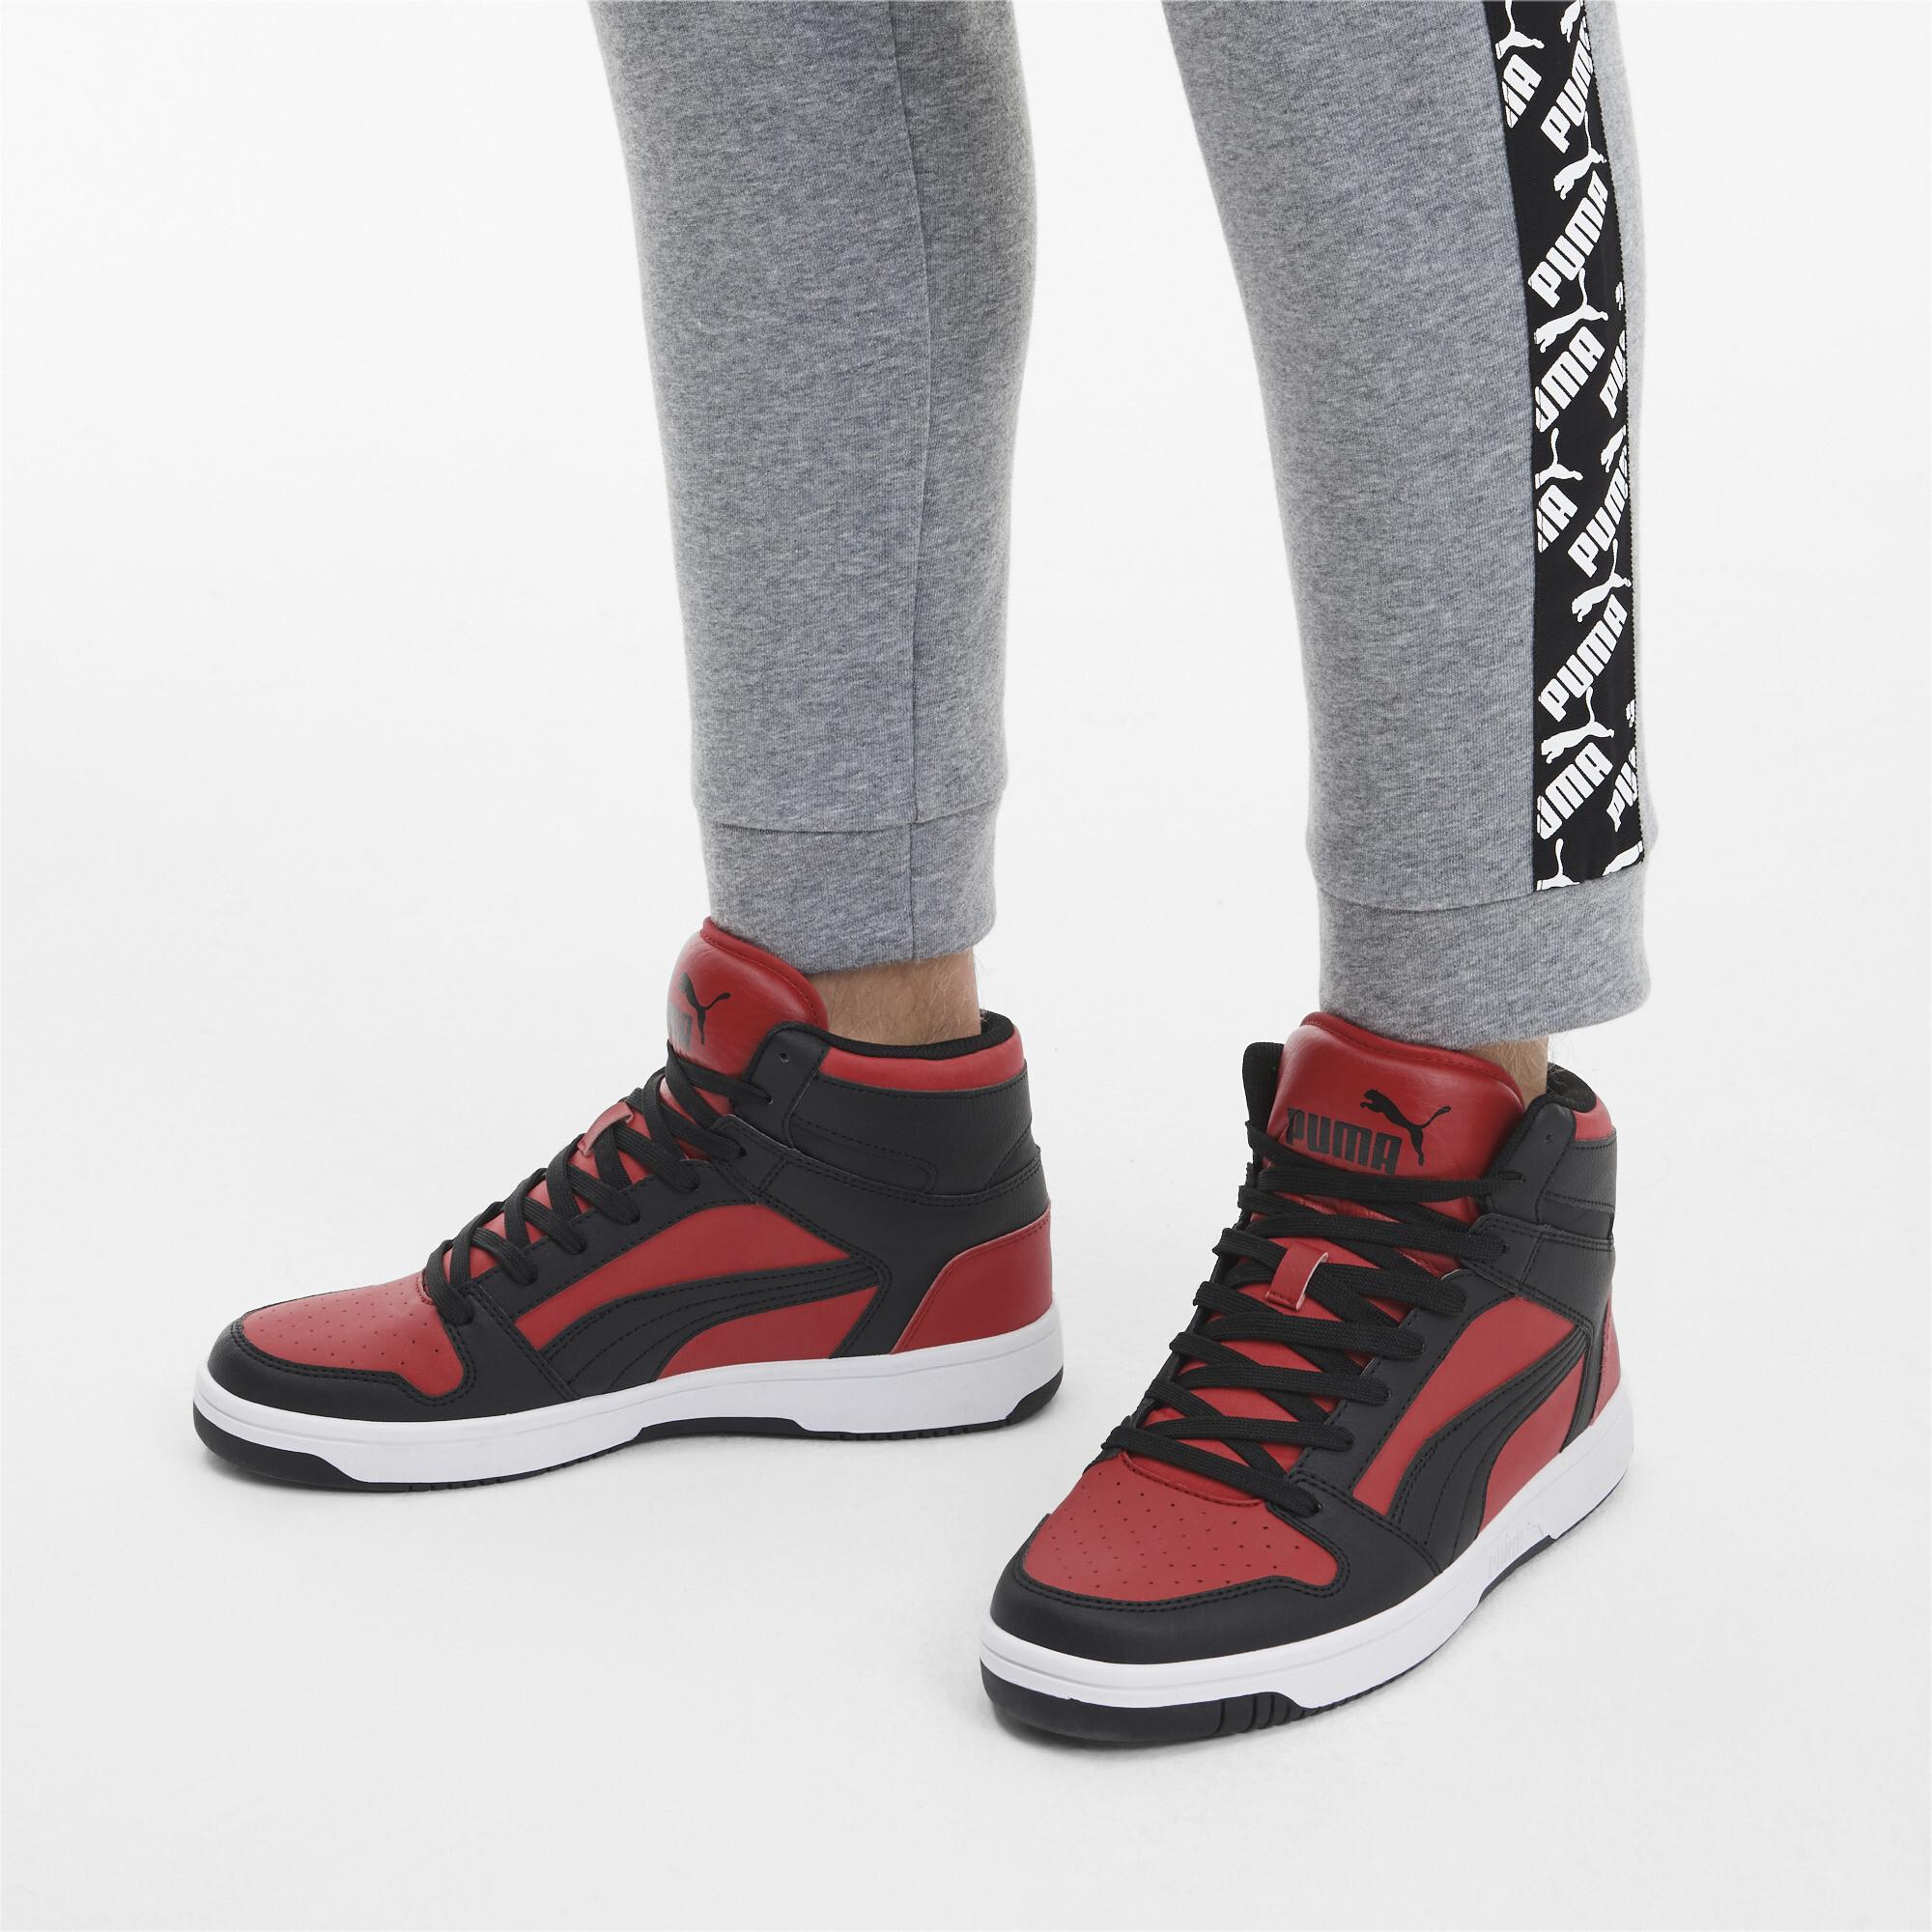 PUMA-PUMA-Rebound-LayUp-Men-039-s-Sneakers-Men-Mid-Boot-Basics thumbnail 20